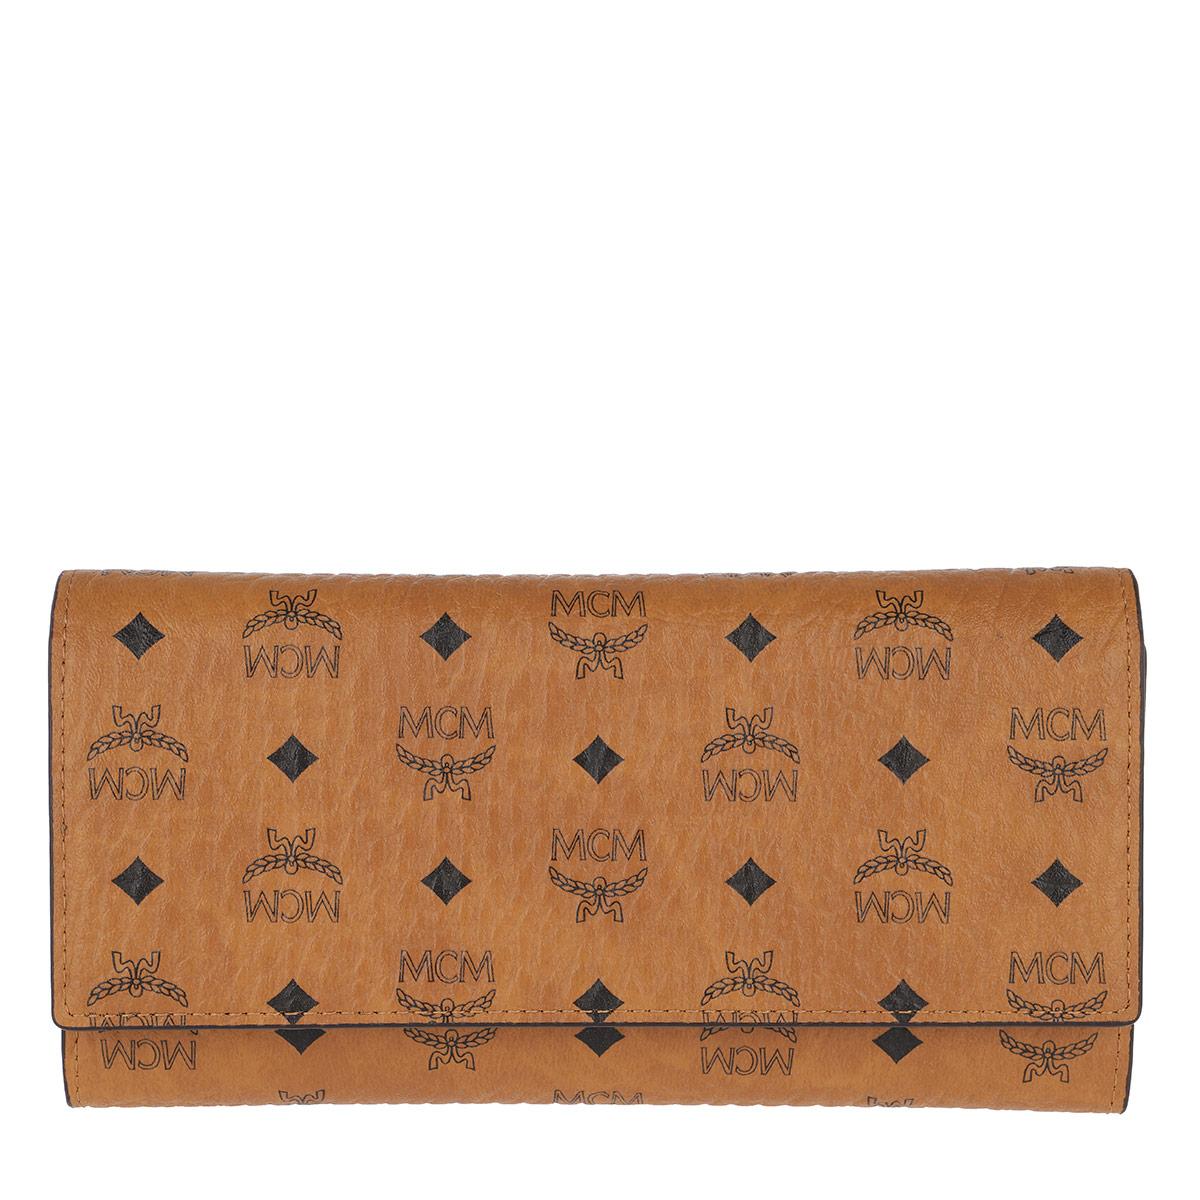 MCM Portemonnaie - Visetos Original Flap Wallet Large Cognac - in cognac - für Damen